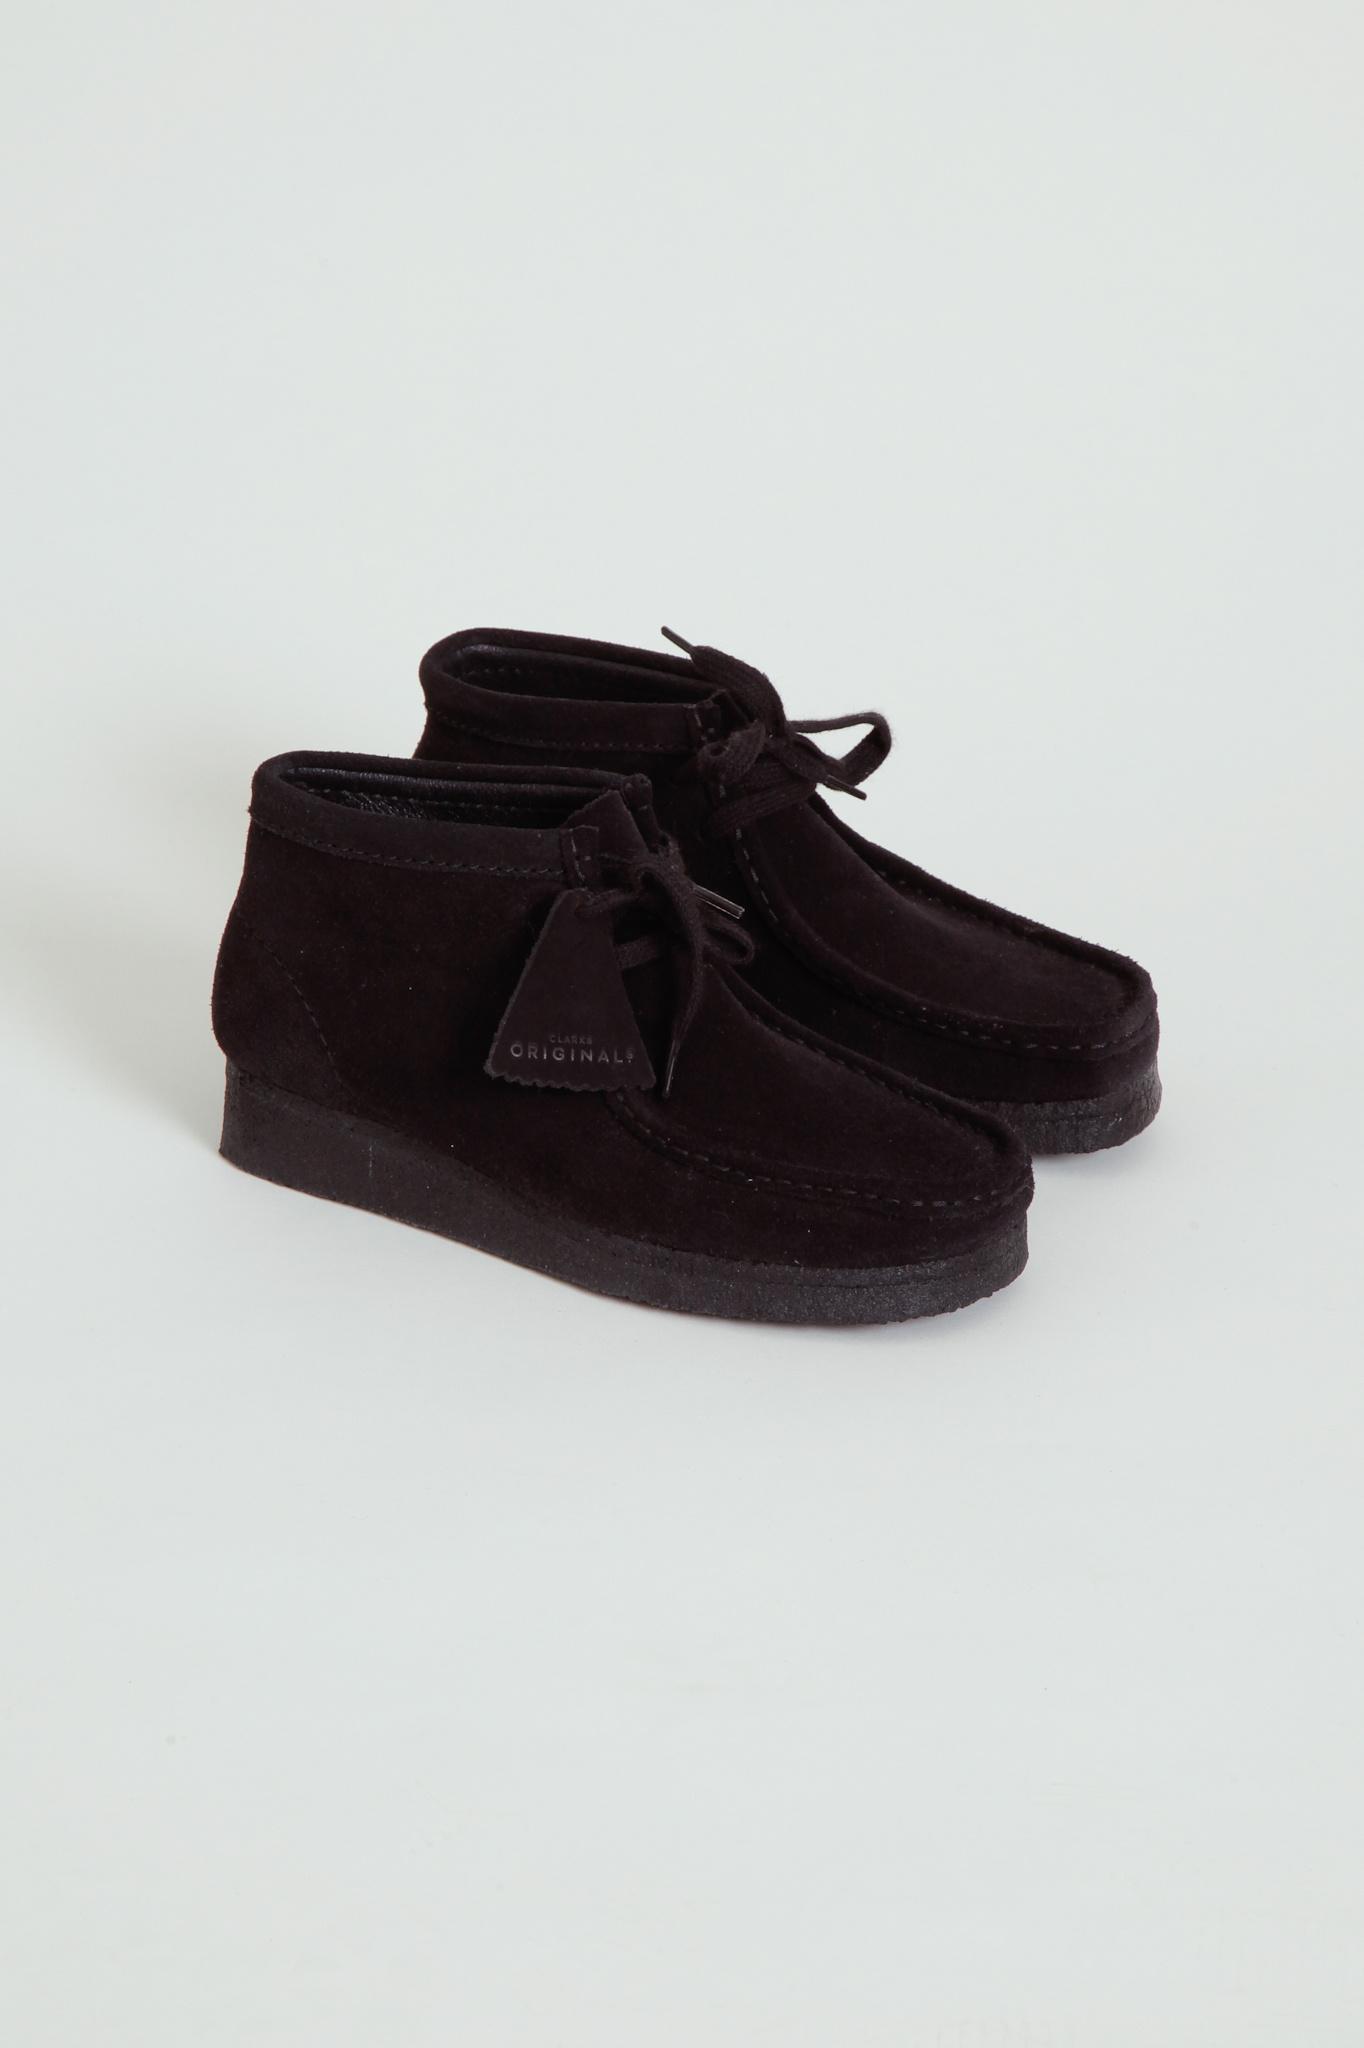 Clarks Clarks Suede Black Wallabee Boot